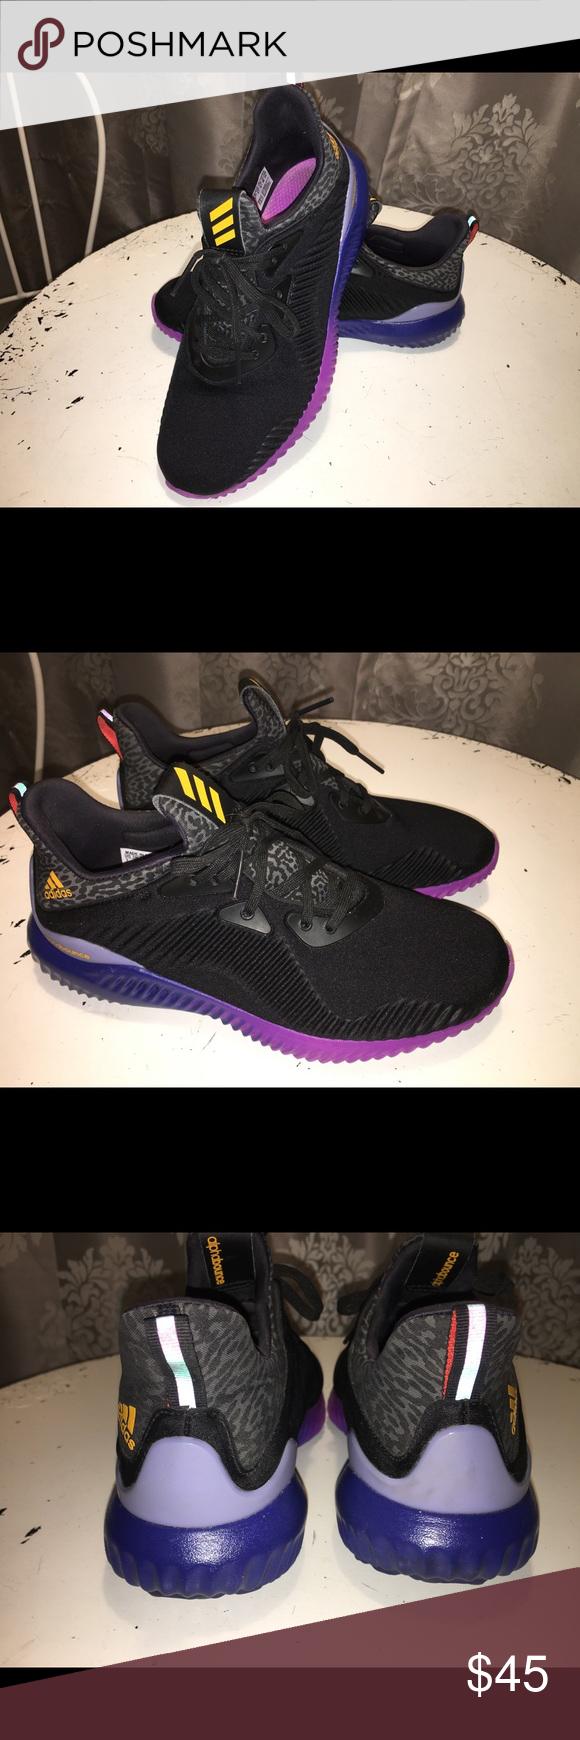 Adidas donne alpha rimbalzare 7 le adidas, scarpe da ginnastica e atletica